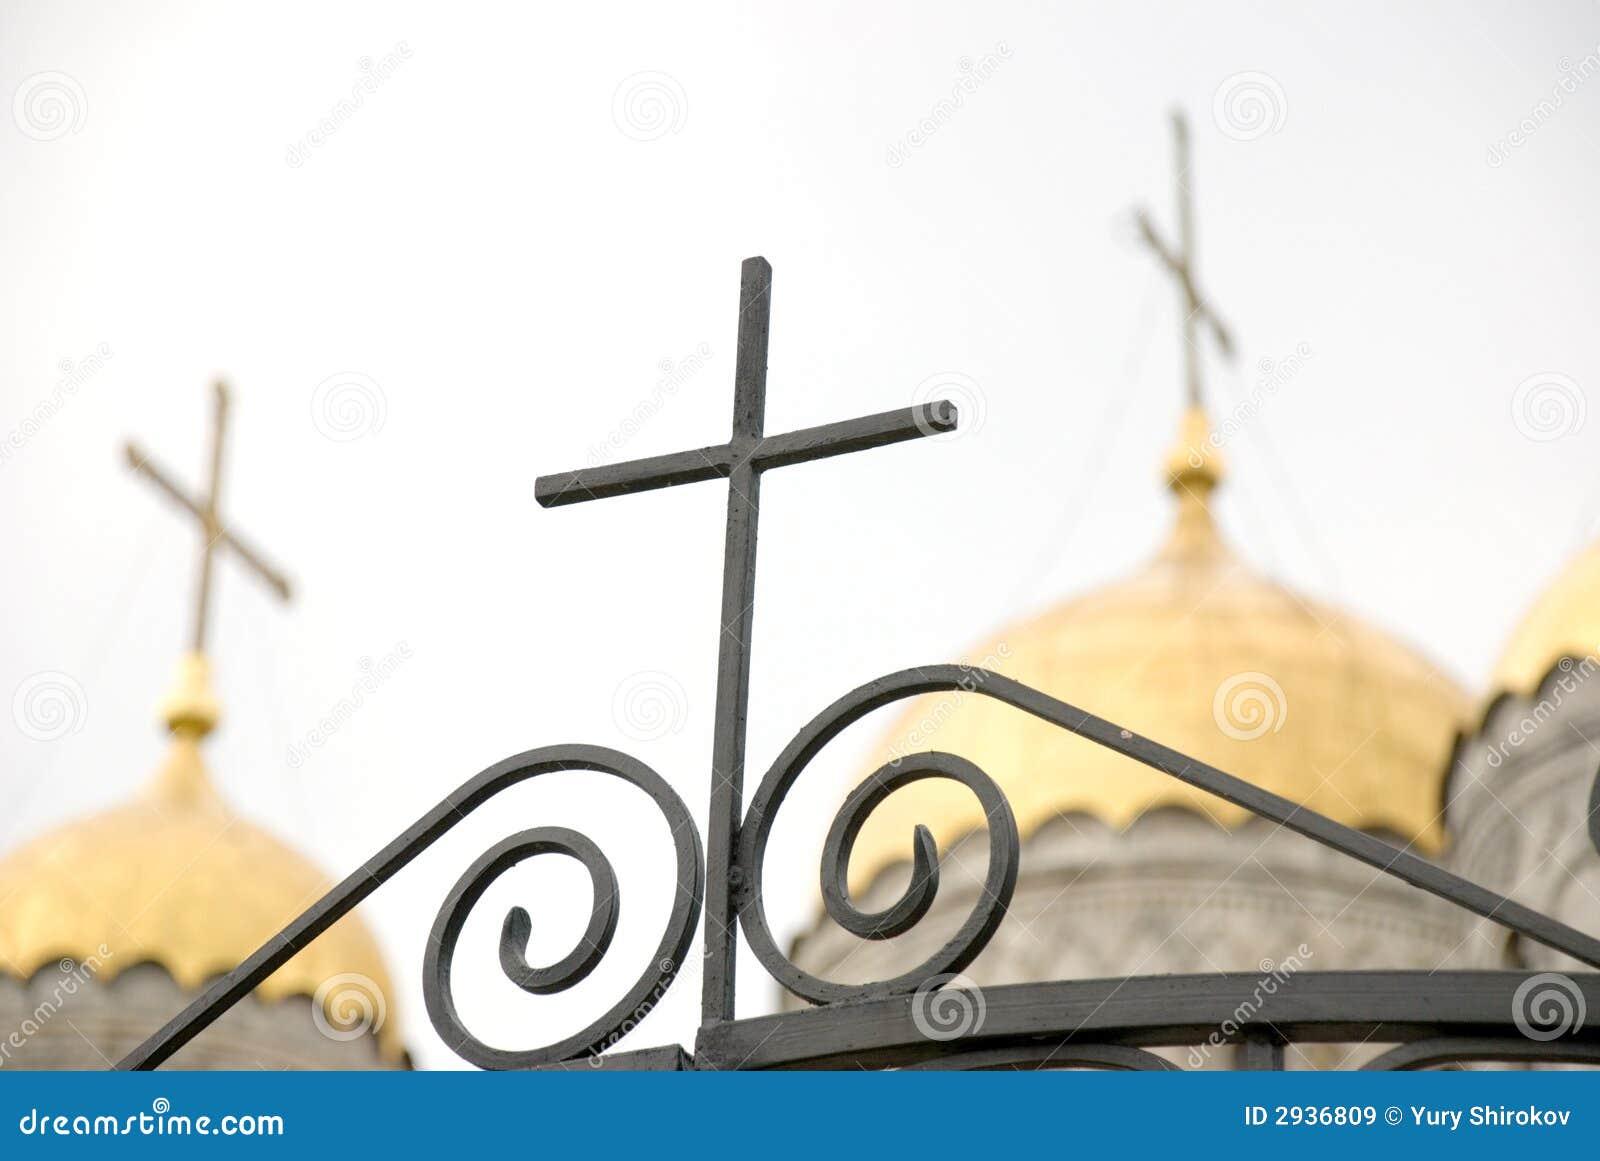 As cruzes